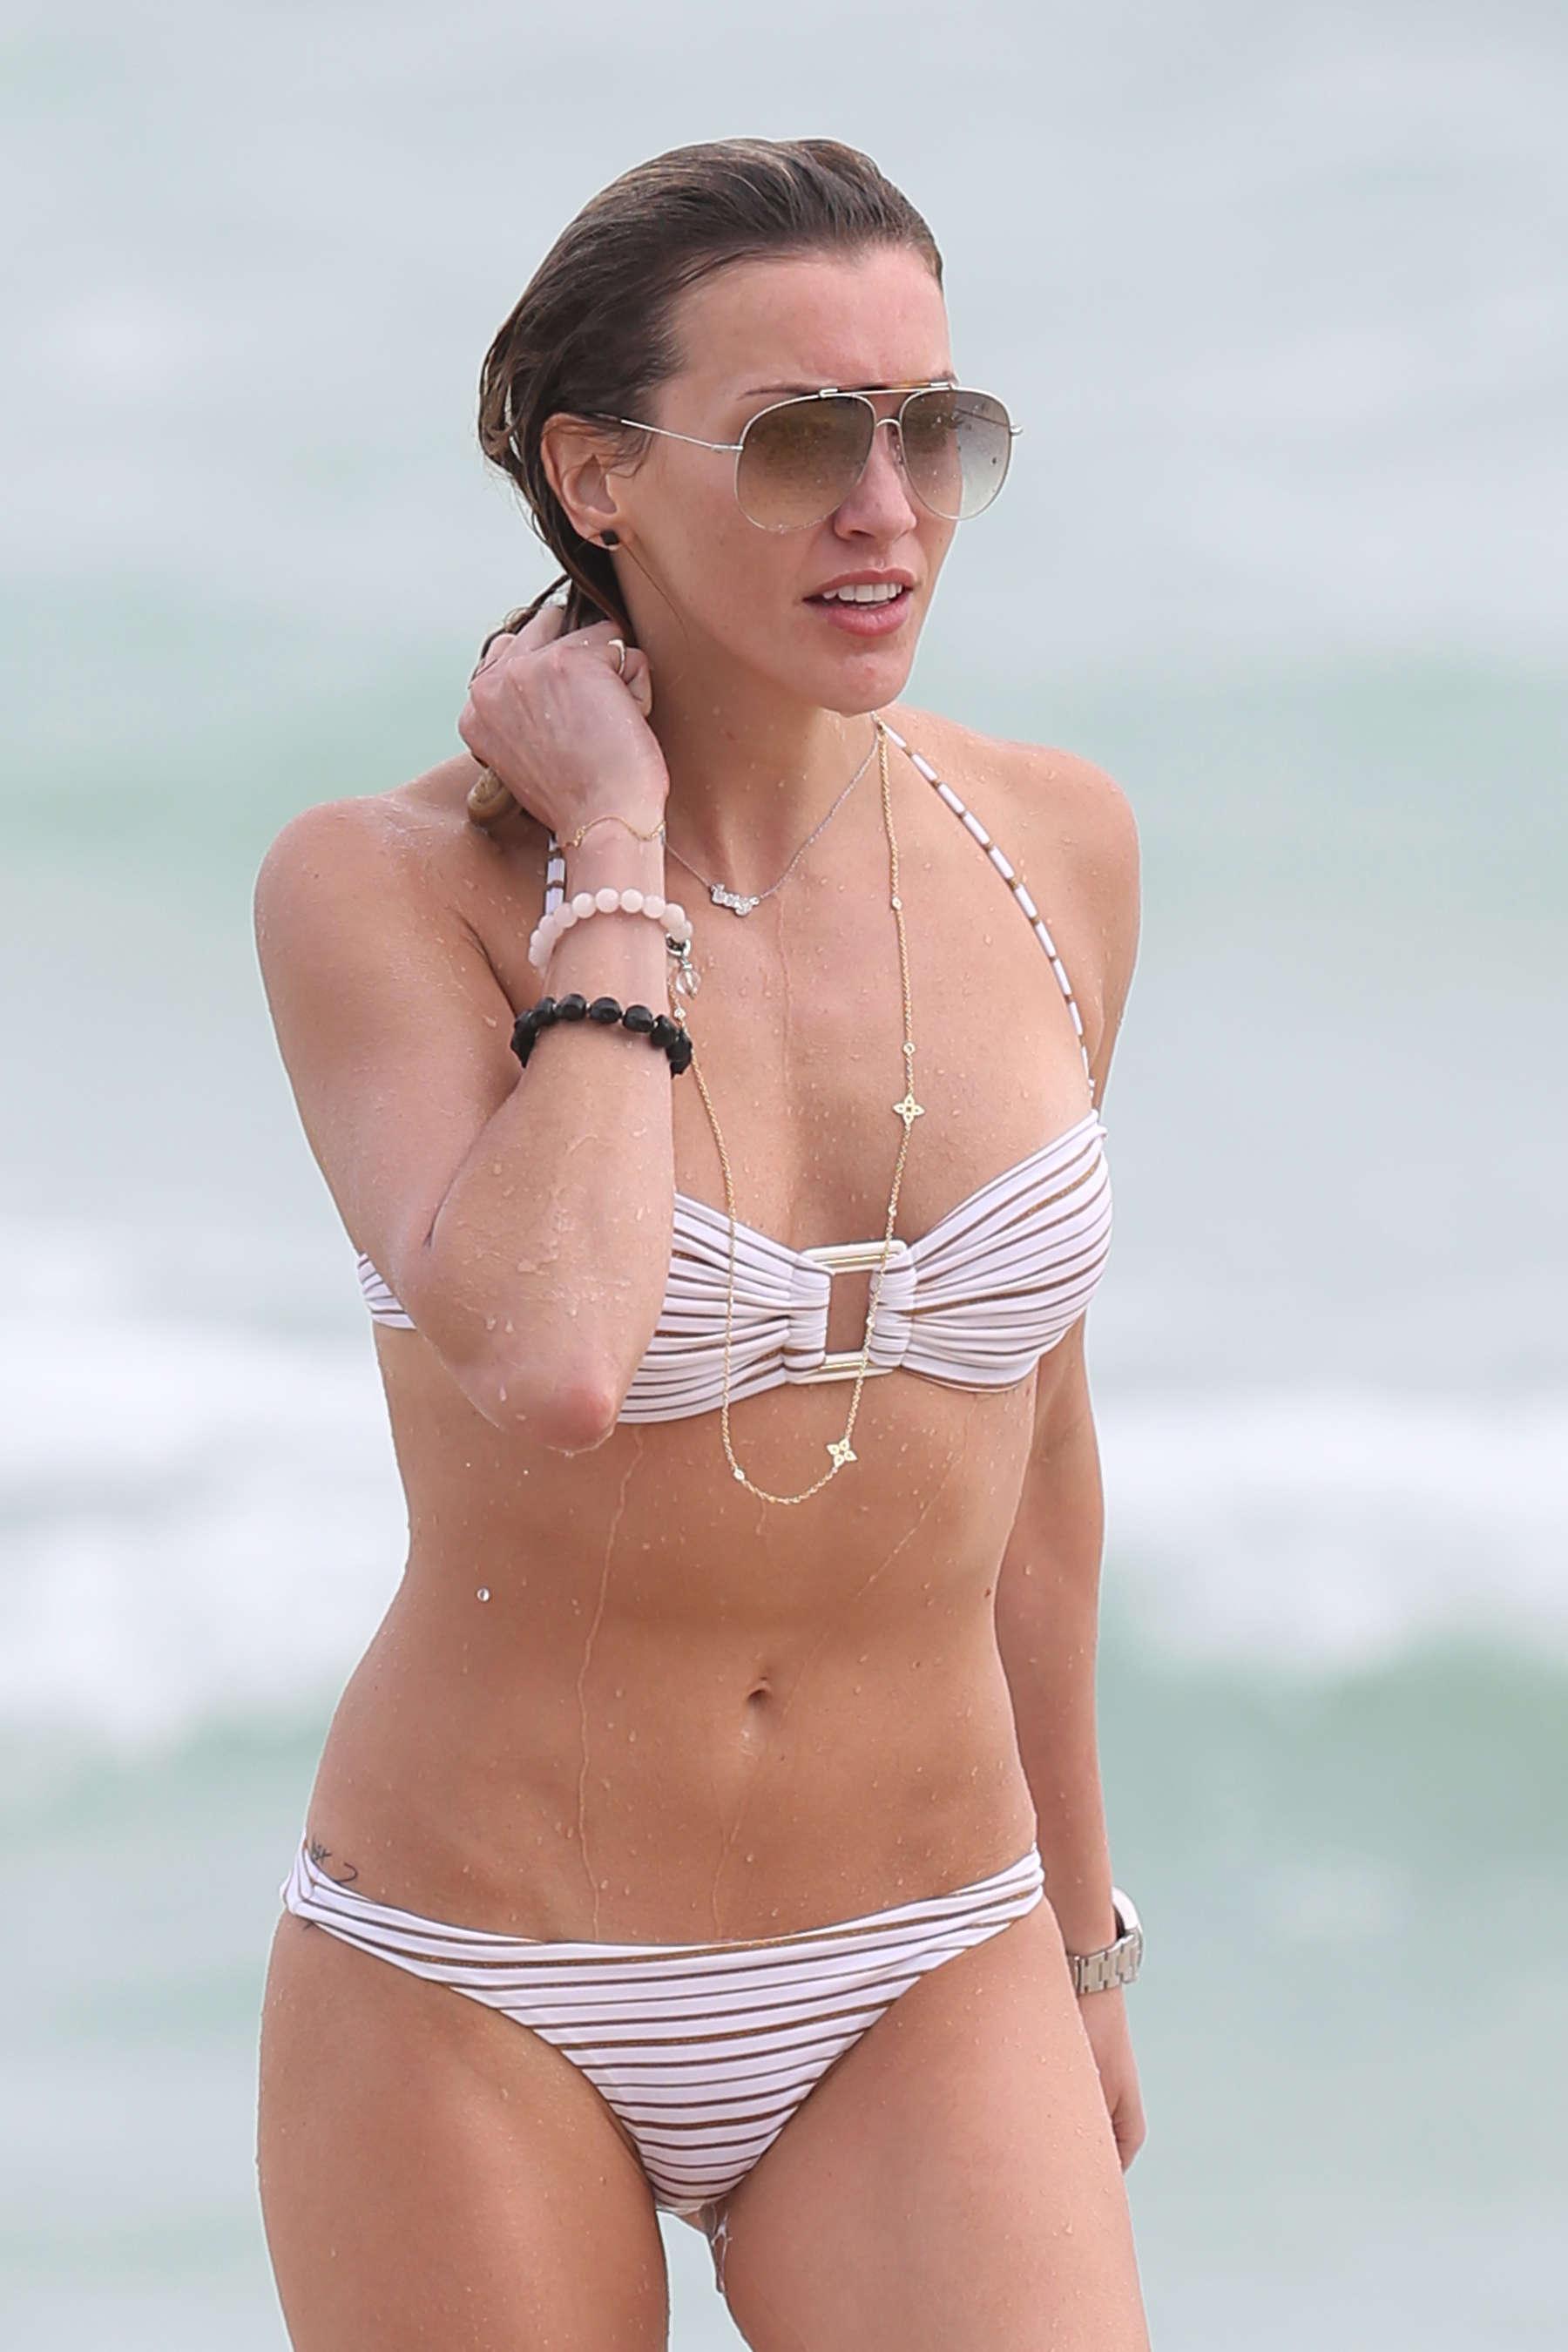 Katie-Cassidy-in-White-Bikini-05